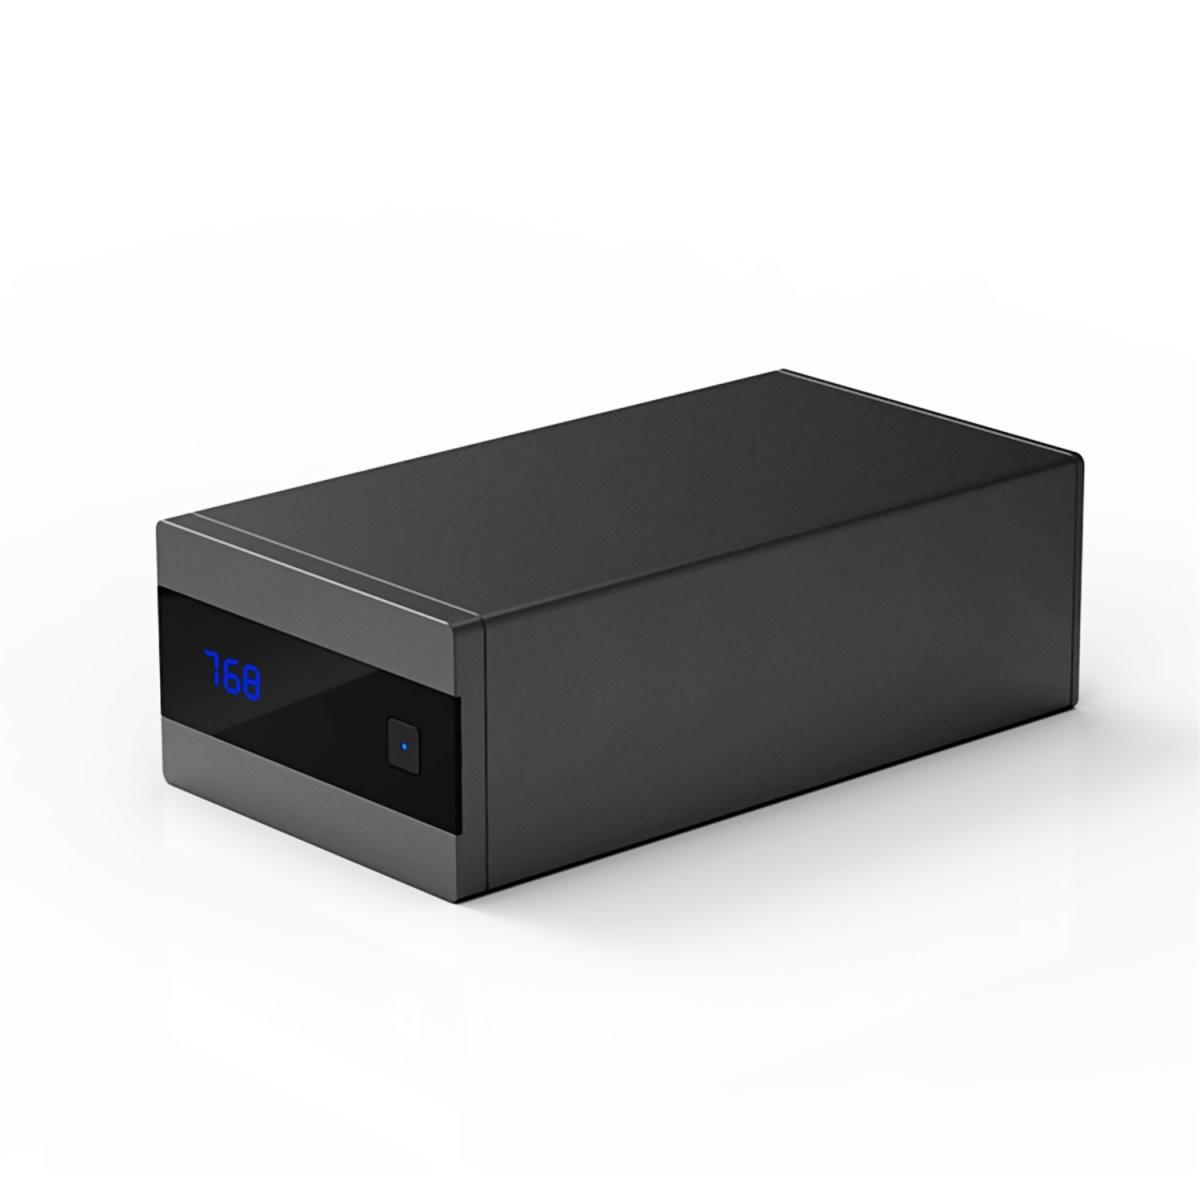 SMSL SANSKRIT 10Th MKII DAC 32bit / 768kHz DSD512 USB XMOS AK4493 Black